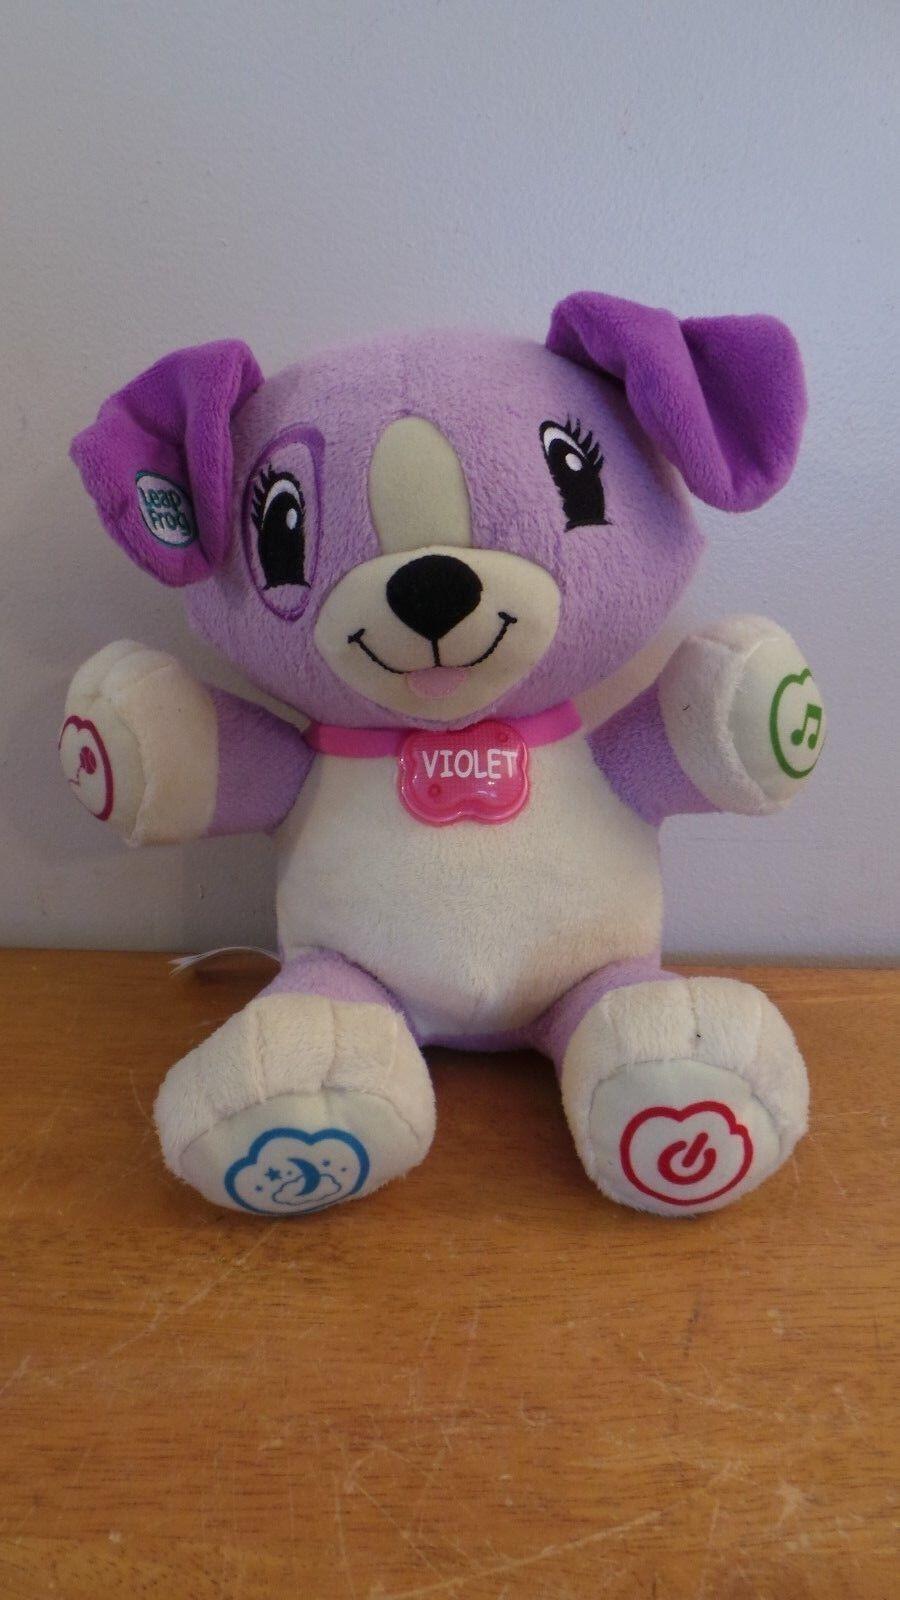 My Pal purple Talking Interactive Puppy Dog Learning Plush LeapFrog